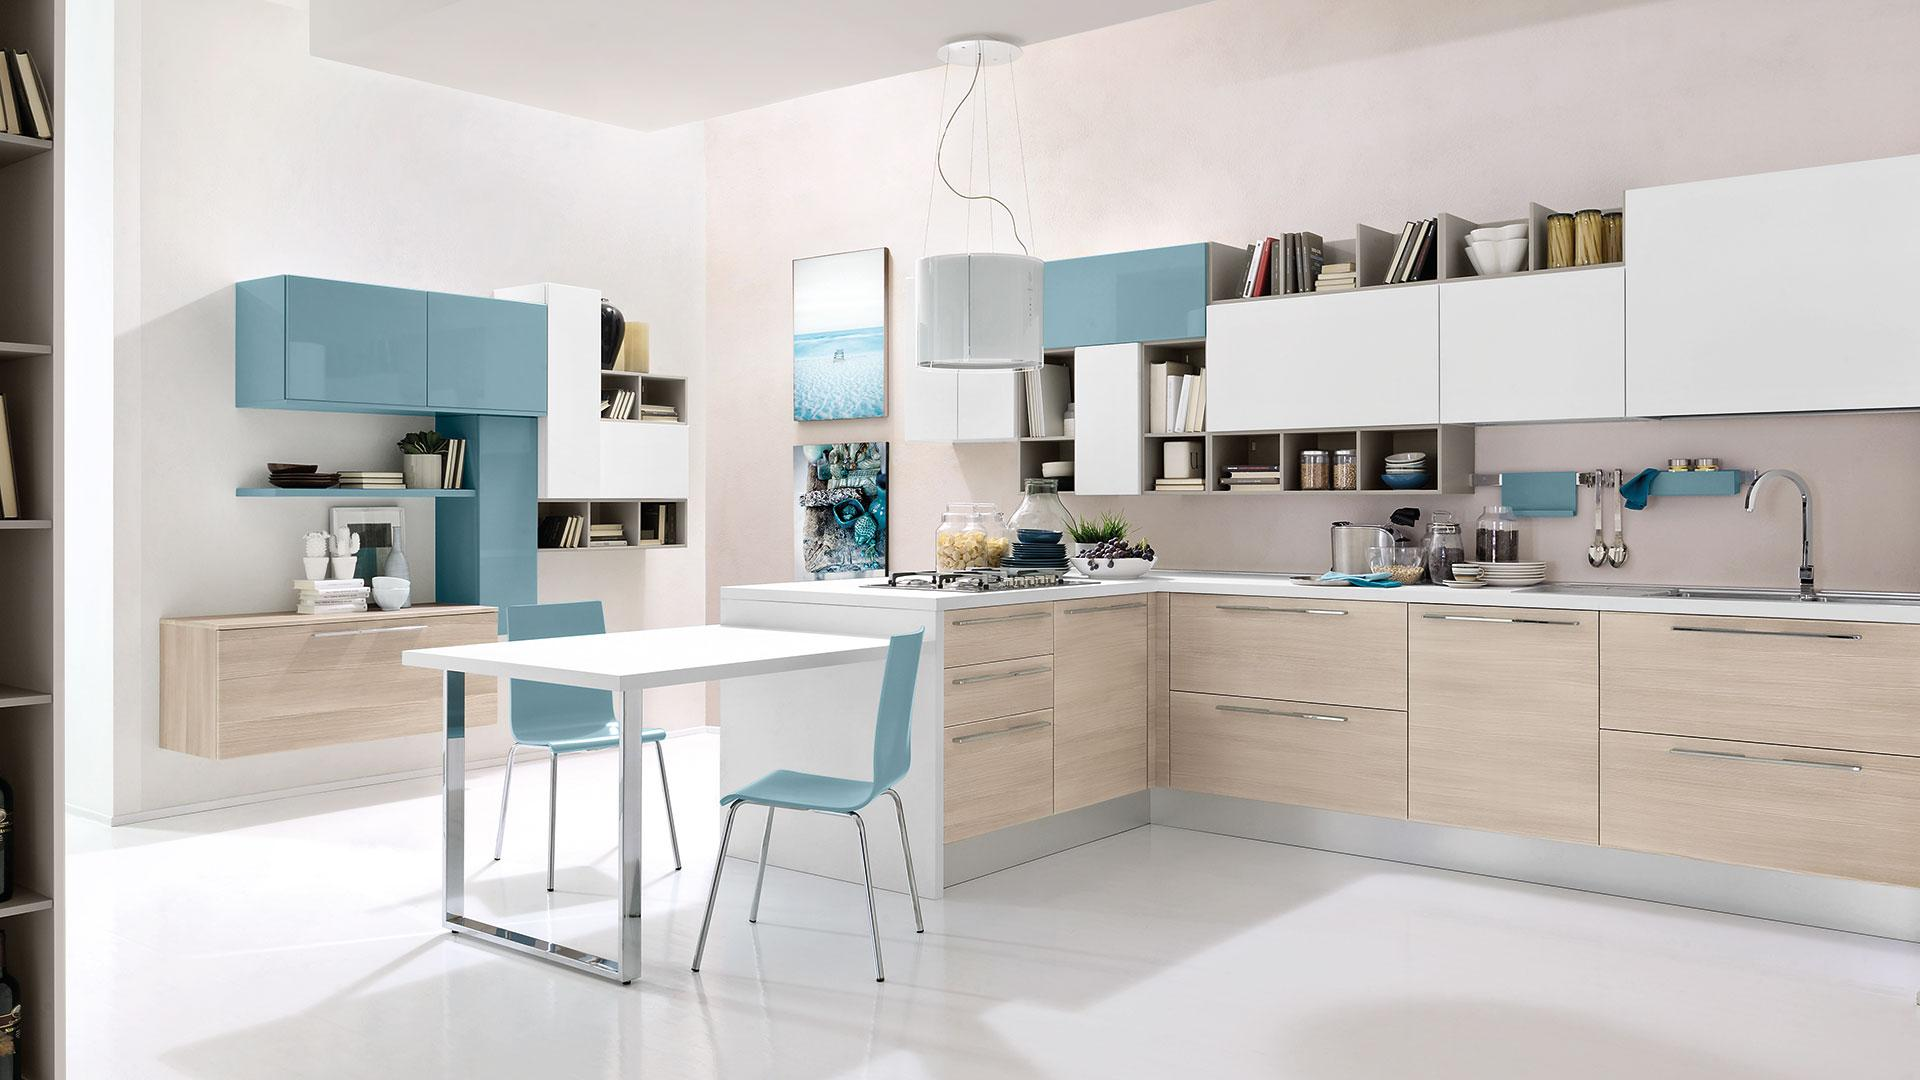 Ricambi Cucine Lube Napoli novamobili arredamenti - cucine novamobili giannini